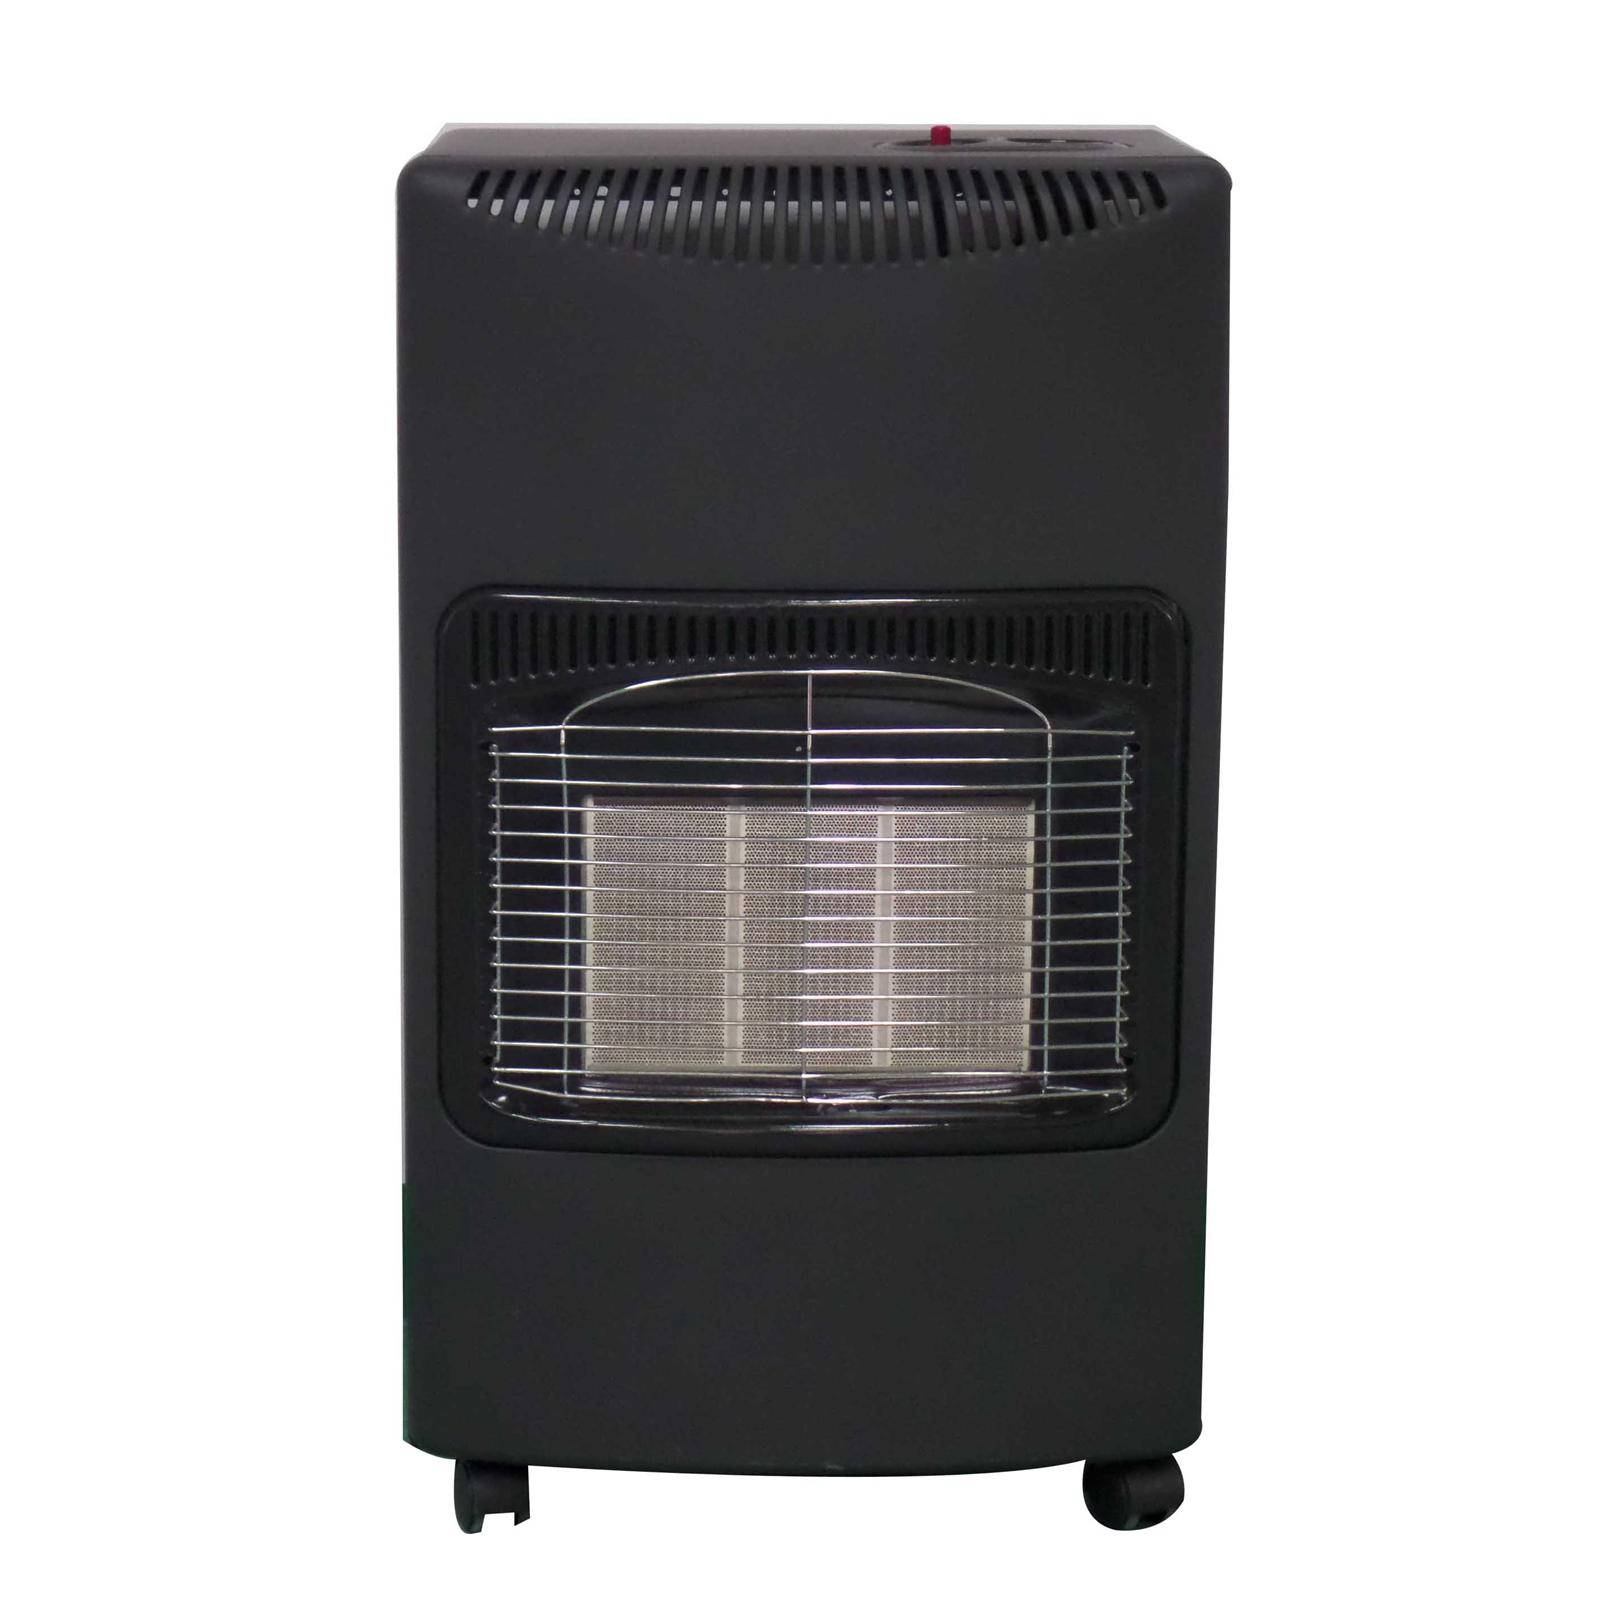 4 2kw Portable Home Butane Fire Calor Gas Cabinet Heater